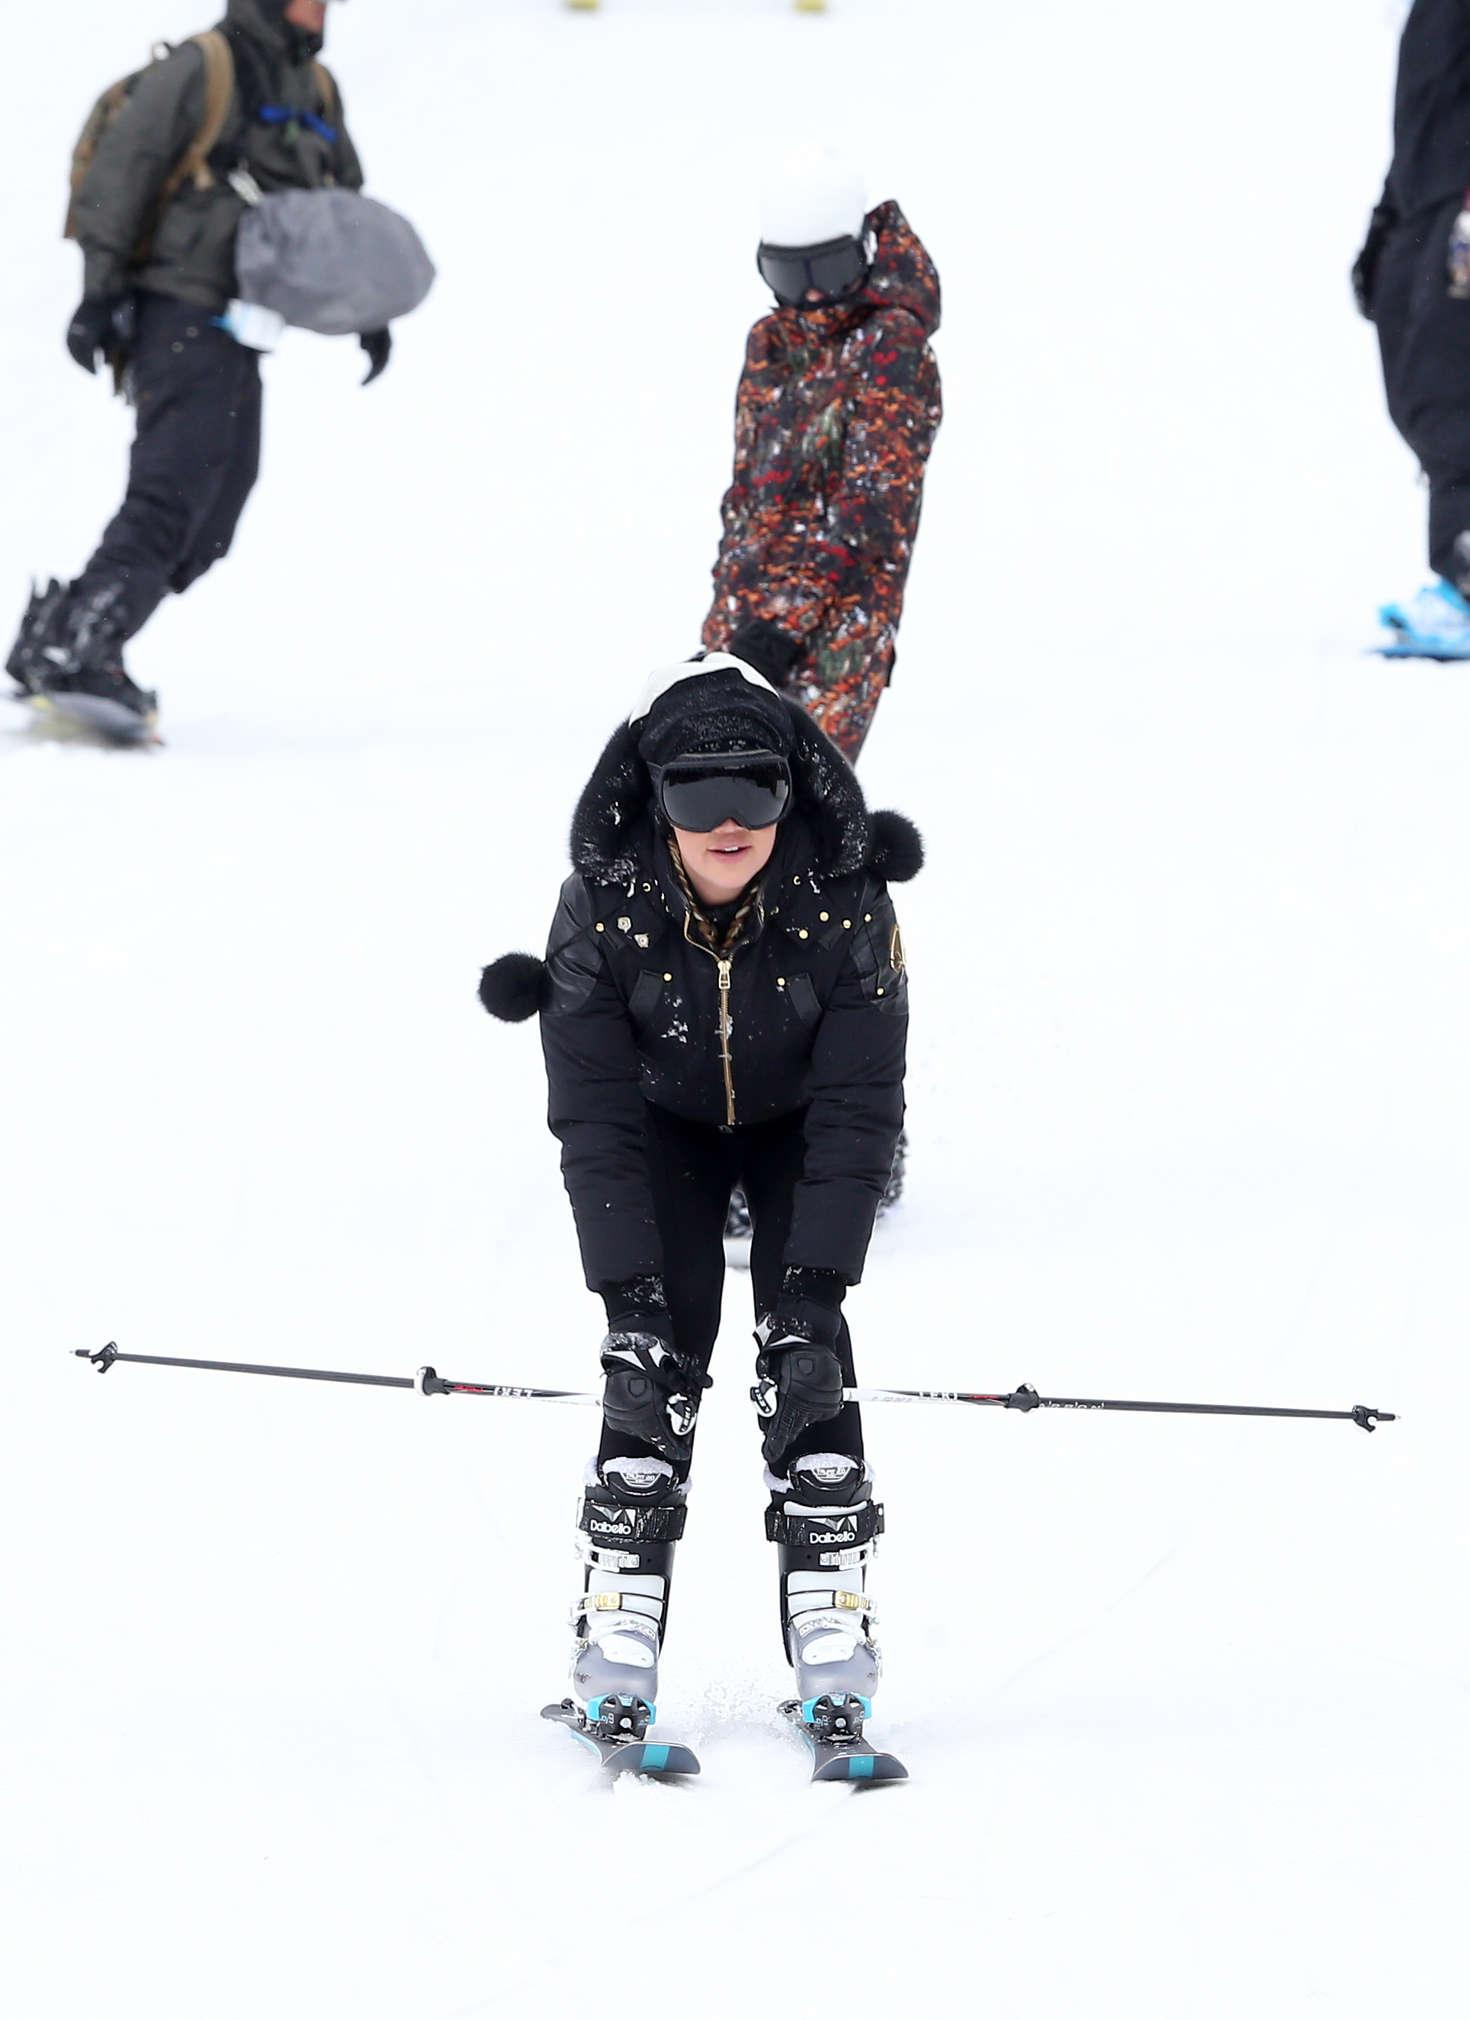 Khloe Kardashian 2016 : Khloe Kardashian: Skiing in Colorado -01